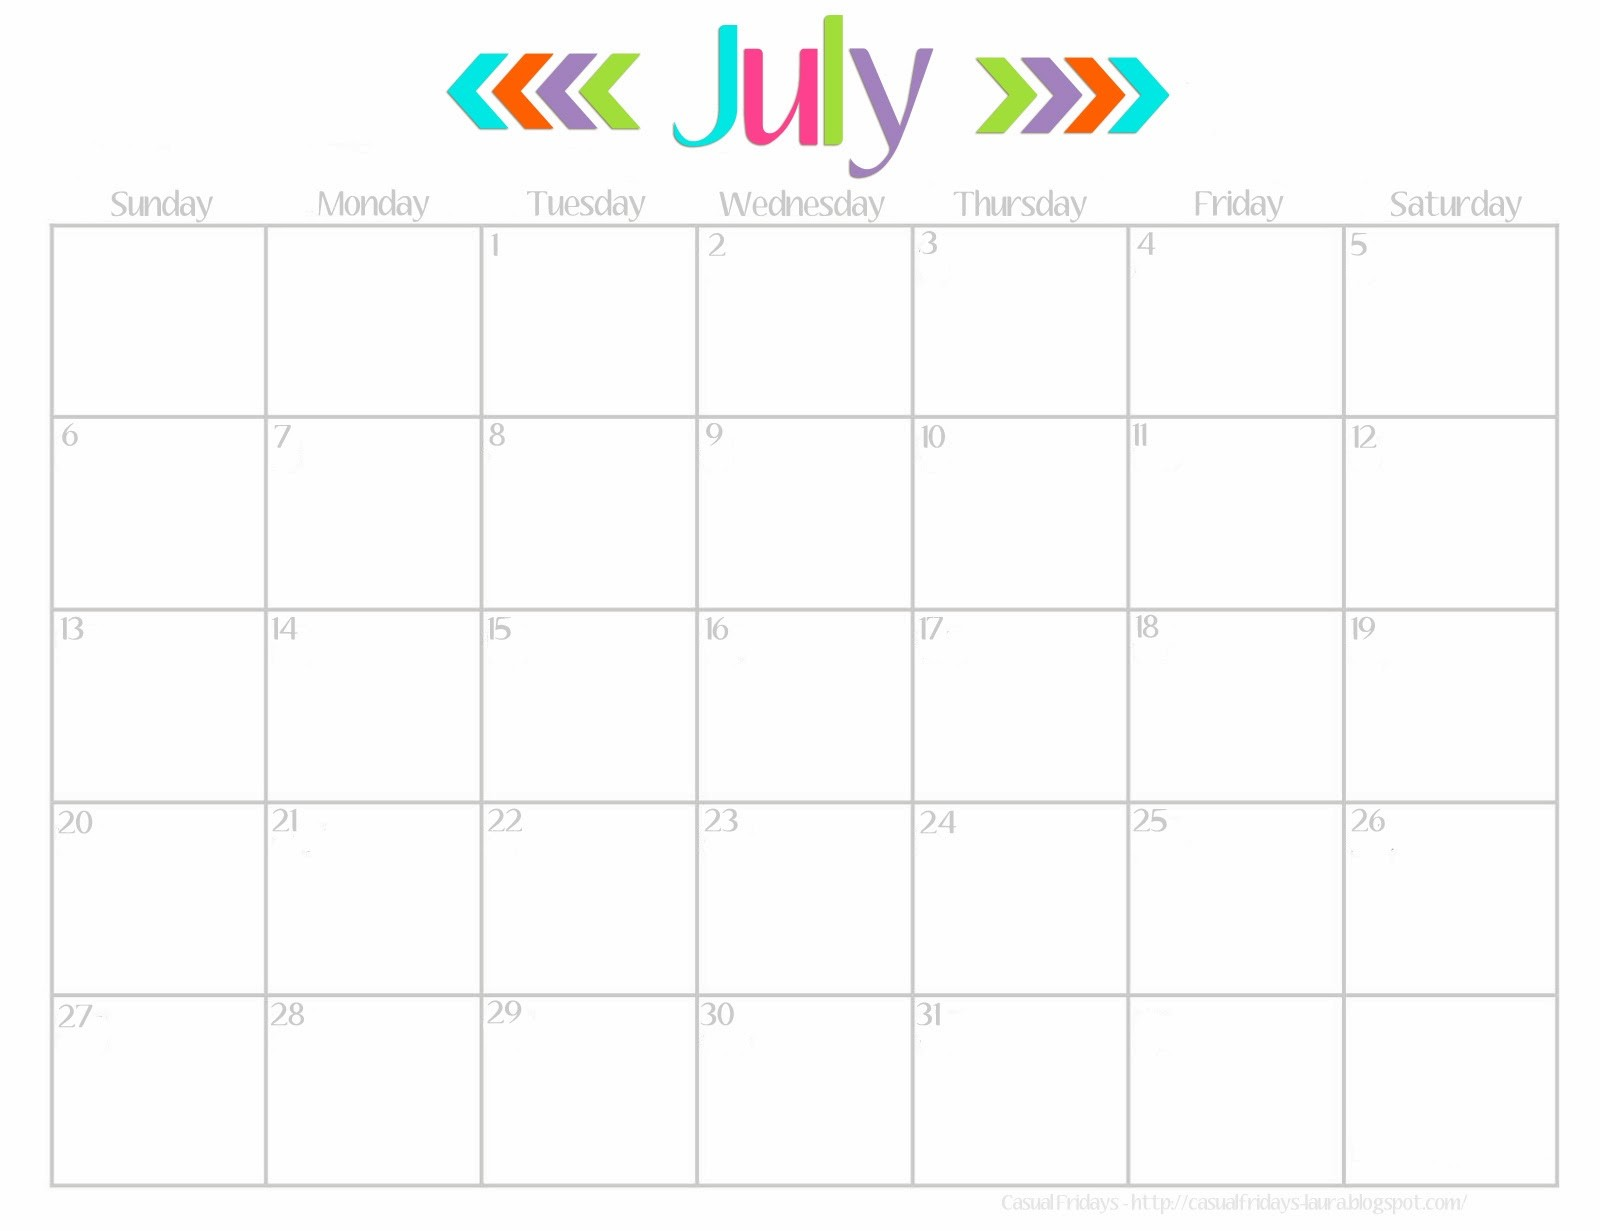 Blank July 2018 Calendar, cute calendar template Lovely Cute July 2018 Calendar